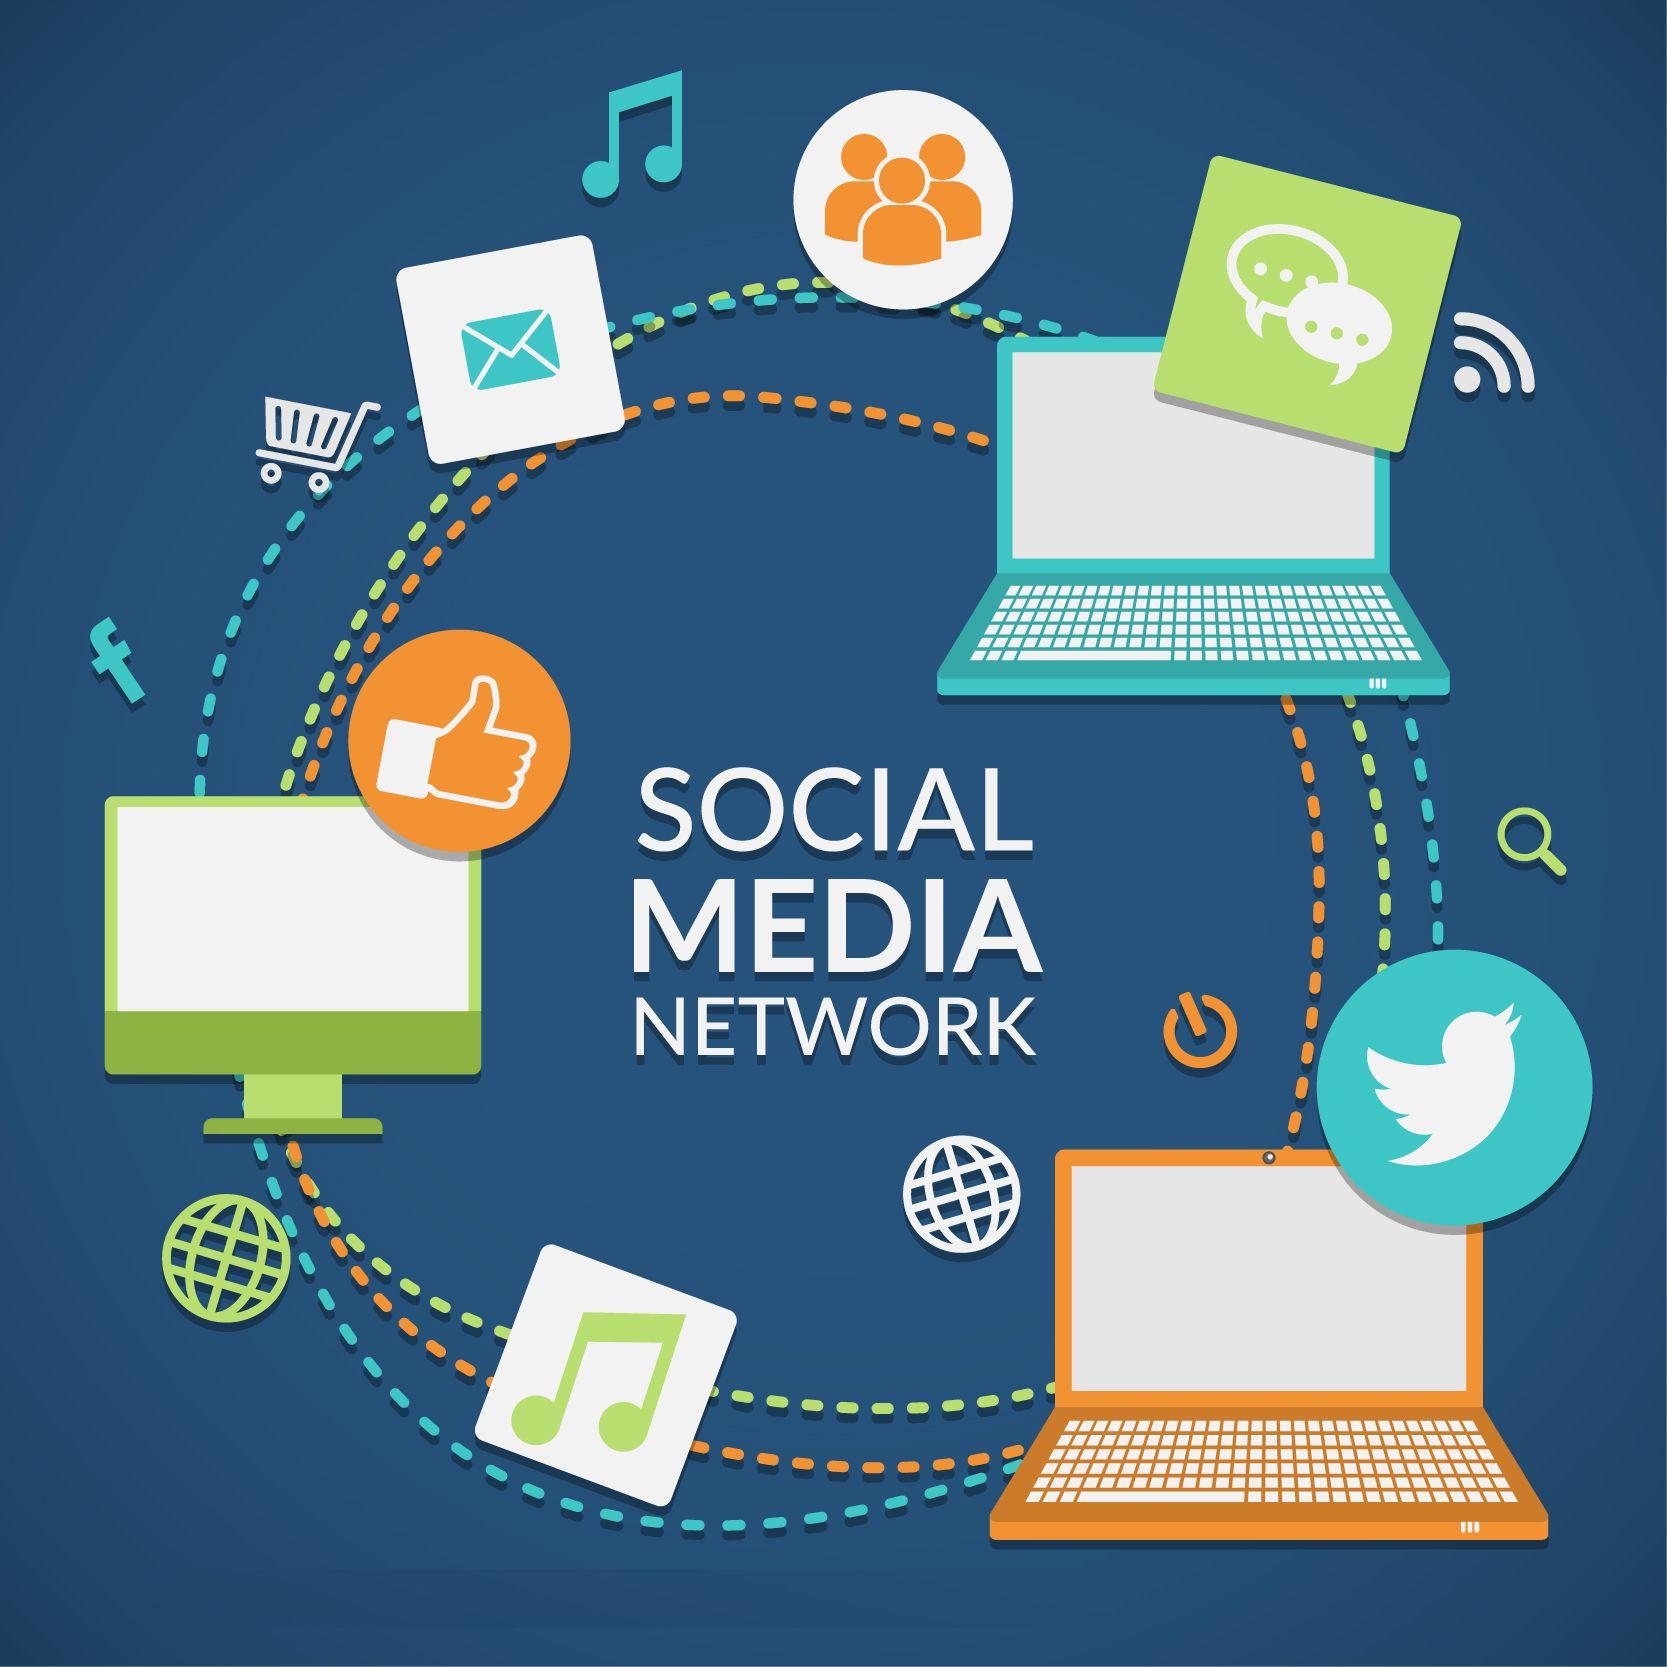 MKmonster gestion de redes sociales empresarial